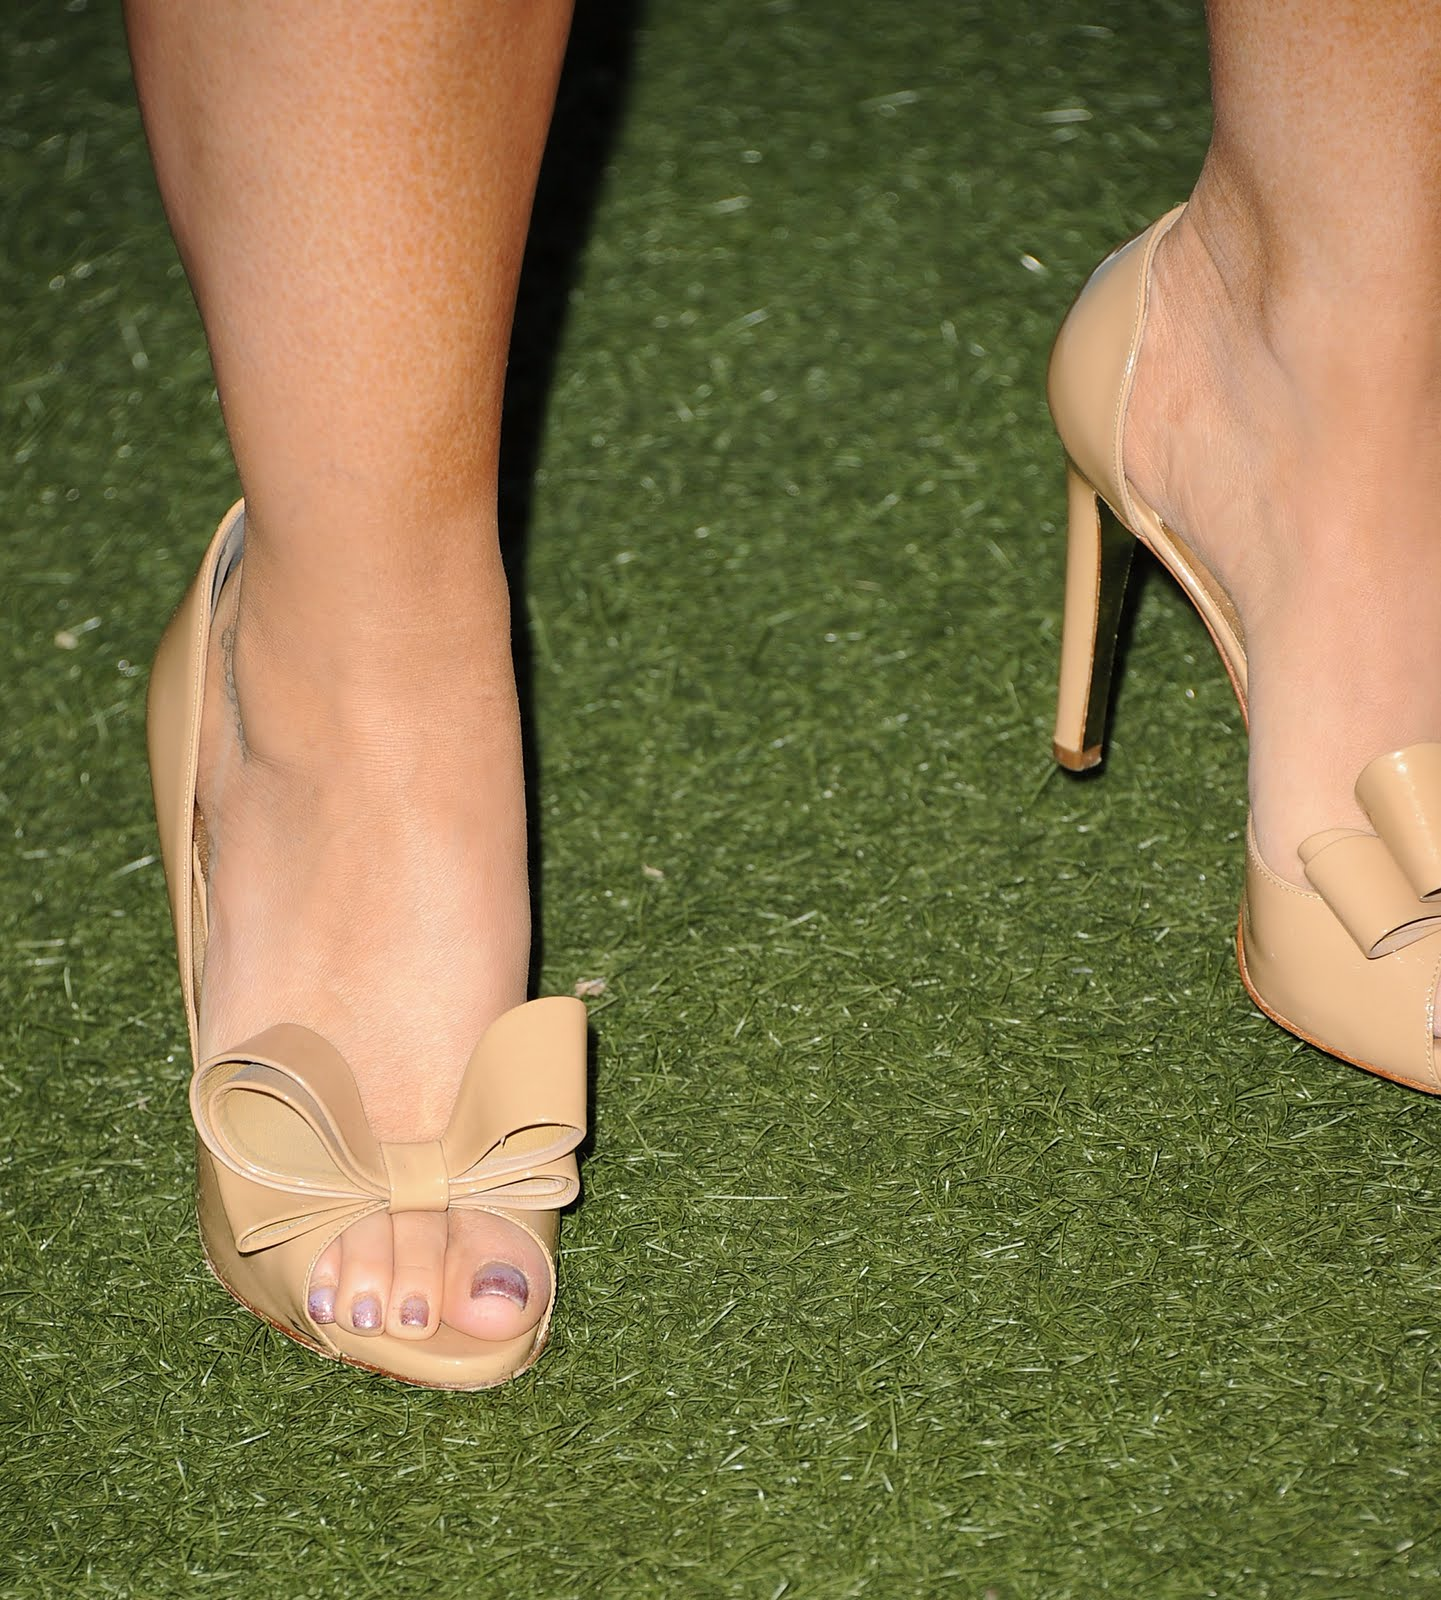 http://1.bp.blogspot.com/-yGLMO0rB_OM/Tk5yJuaJbFI/AAAAAAAACdY/fpz9bn26YbI/s1600/Jennifer-Love-Hewitt-Feet-478134.jpg